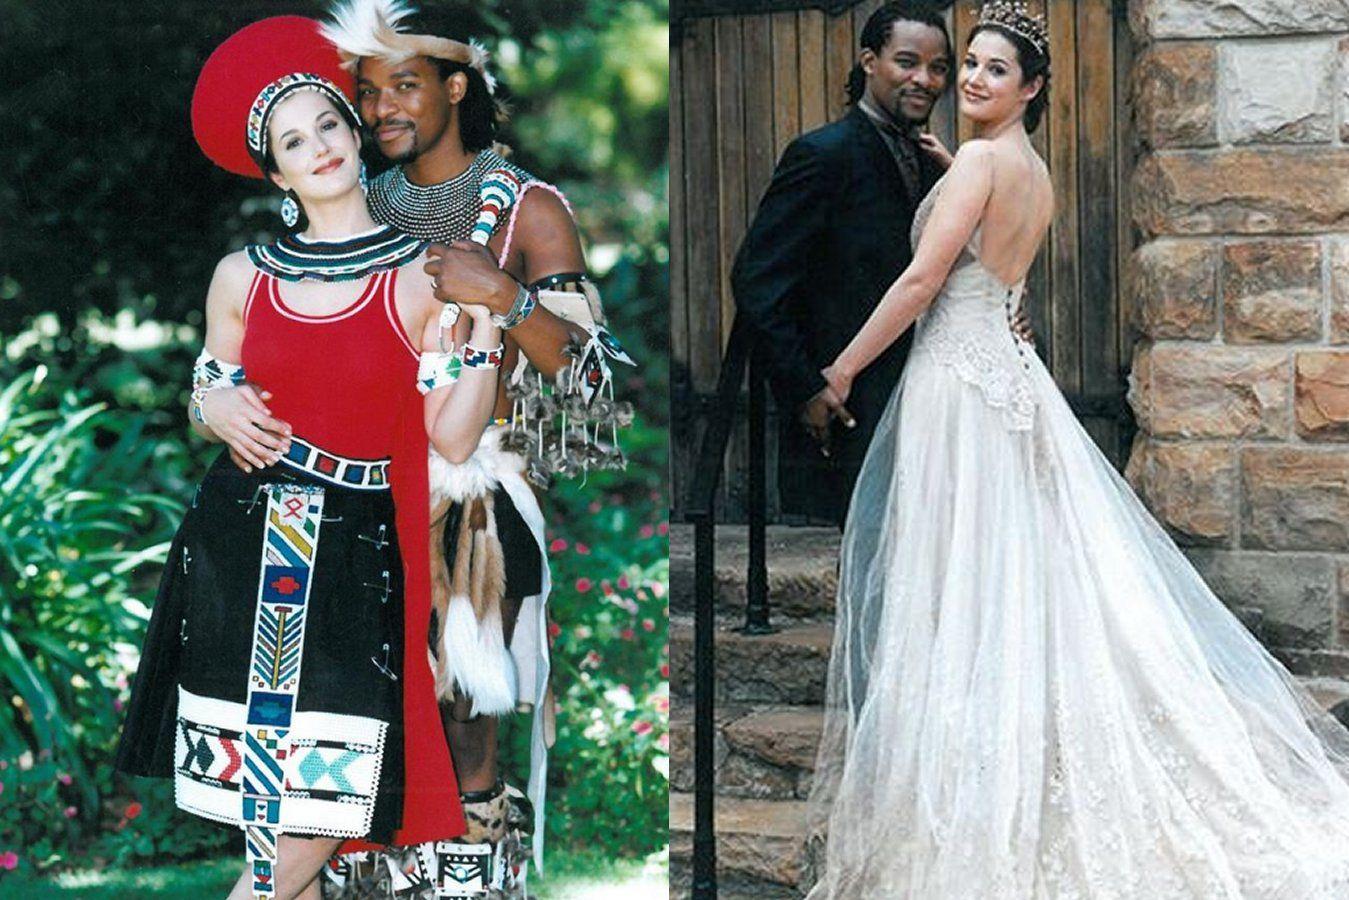 zulu weddings - Google Search   Traditional Attires   Pinterest ...